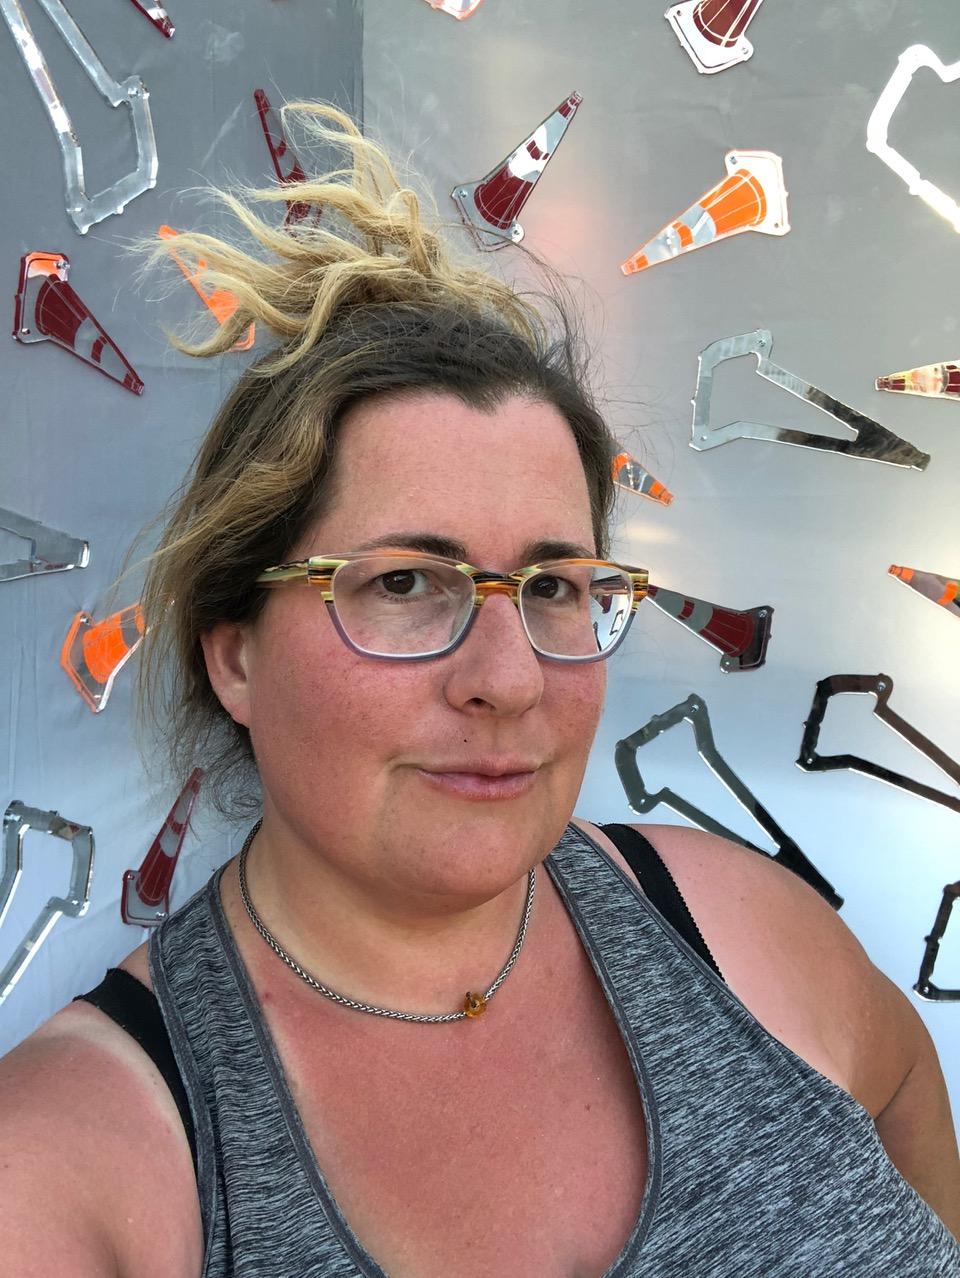 Maker Spotlight: Hapto, AKA Sarah Davitt